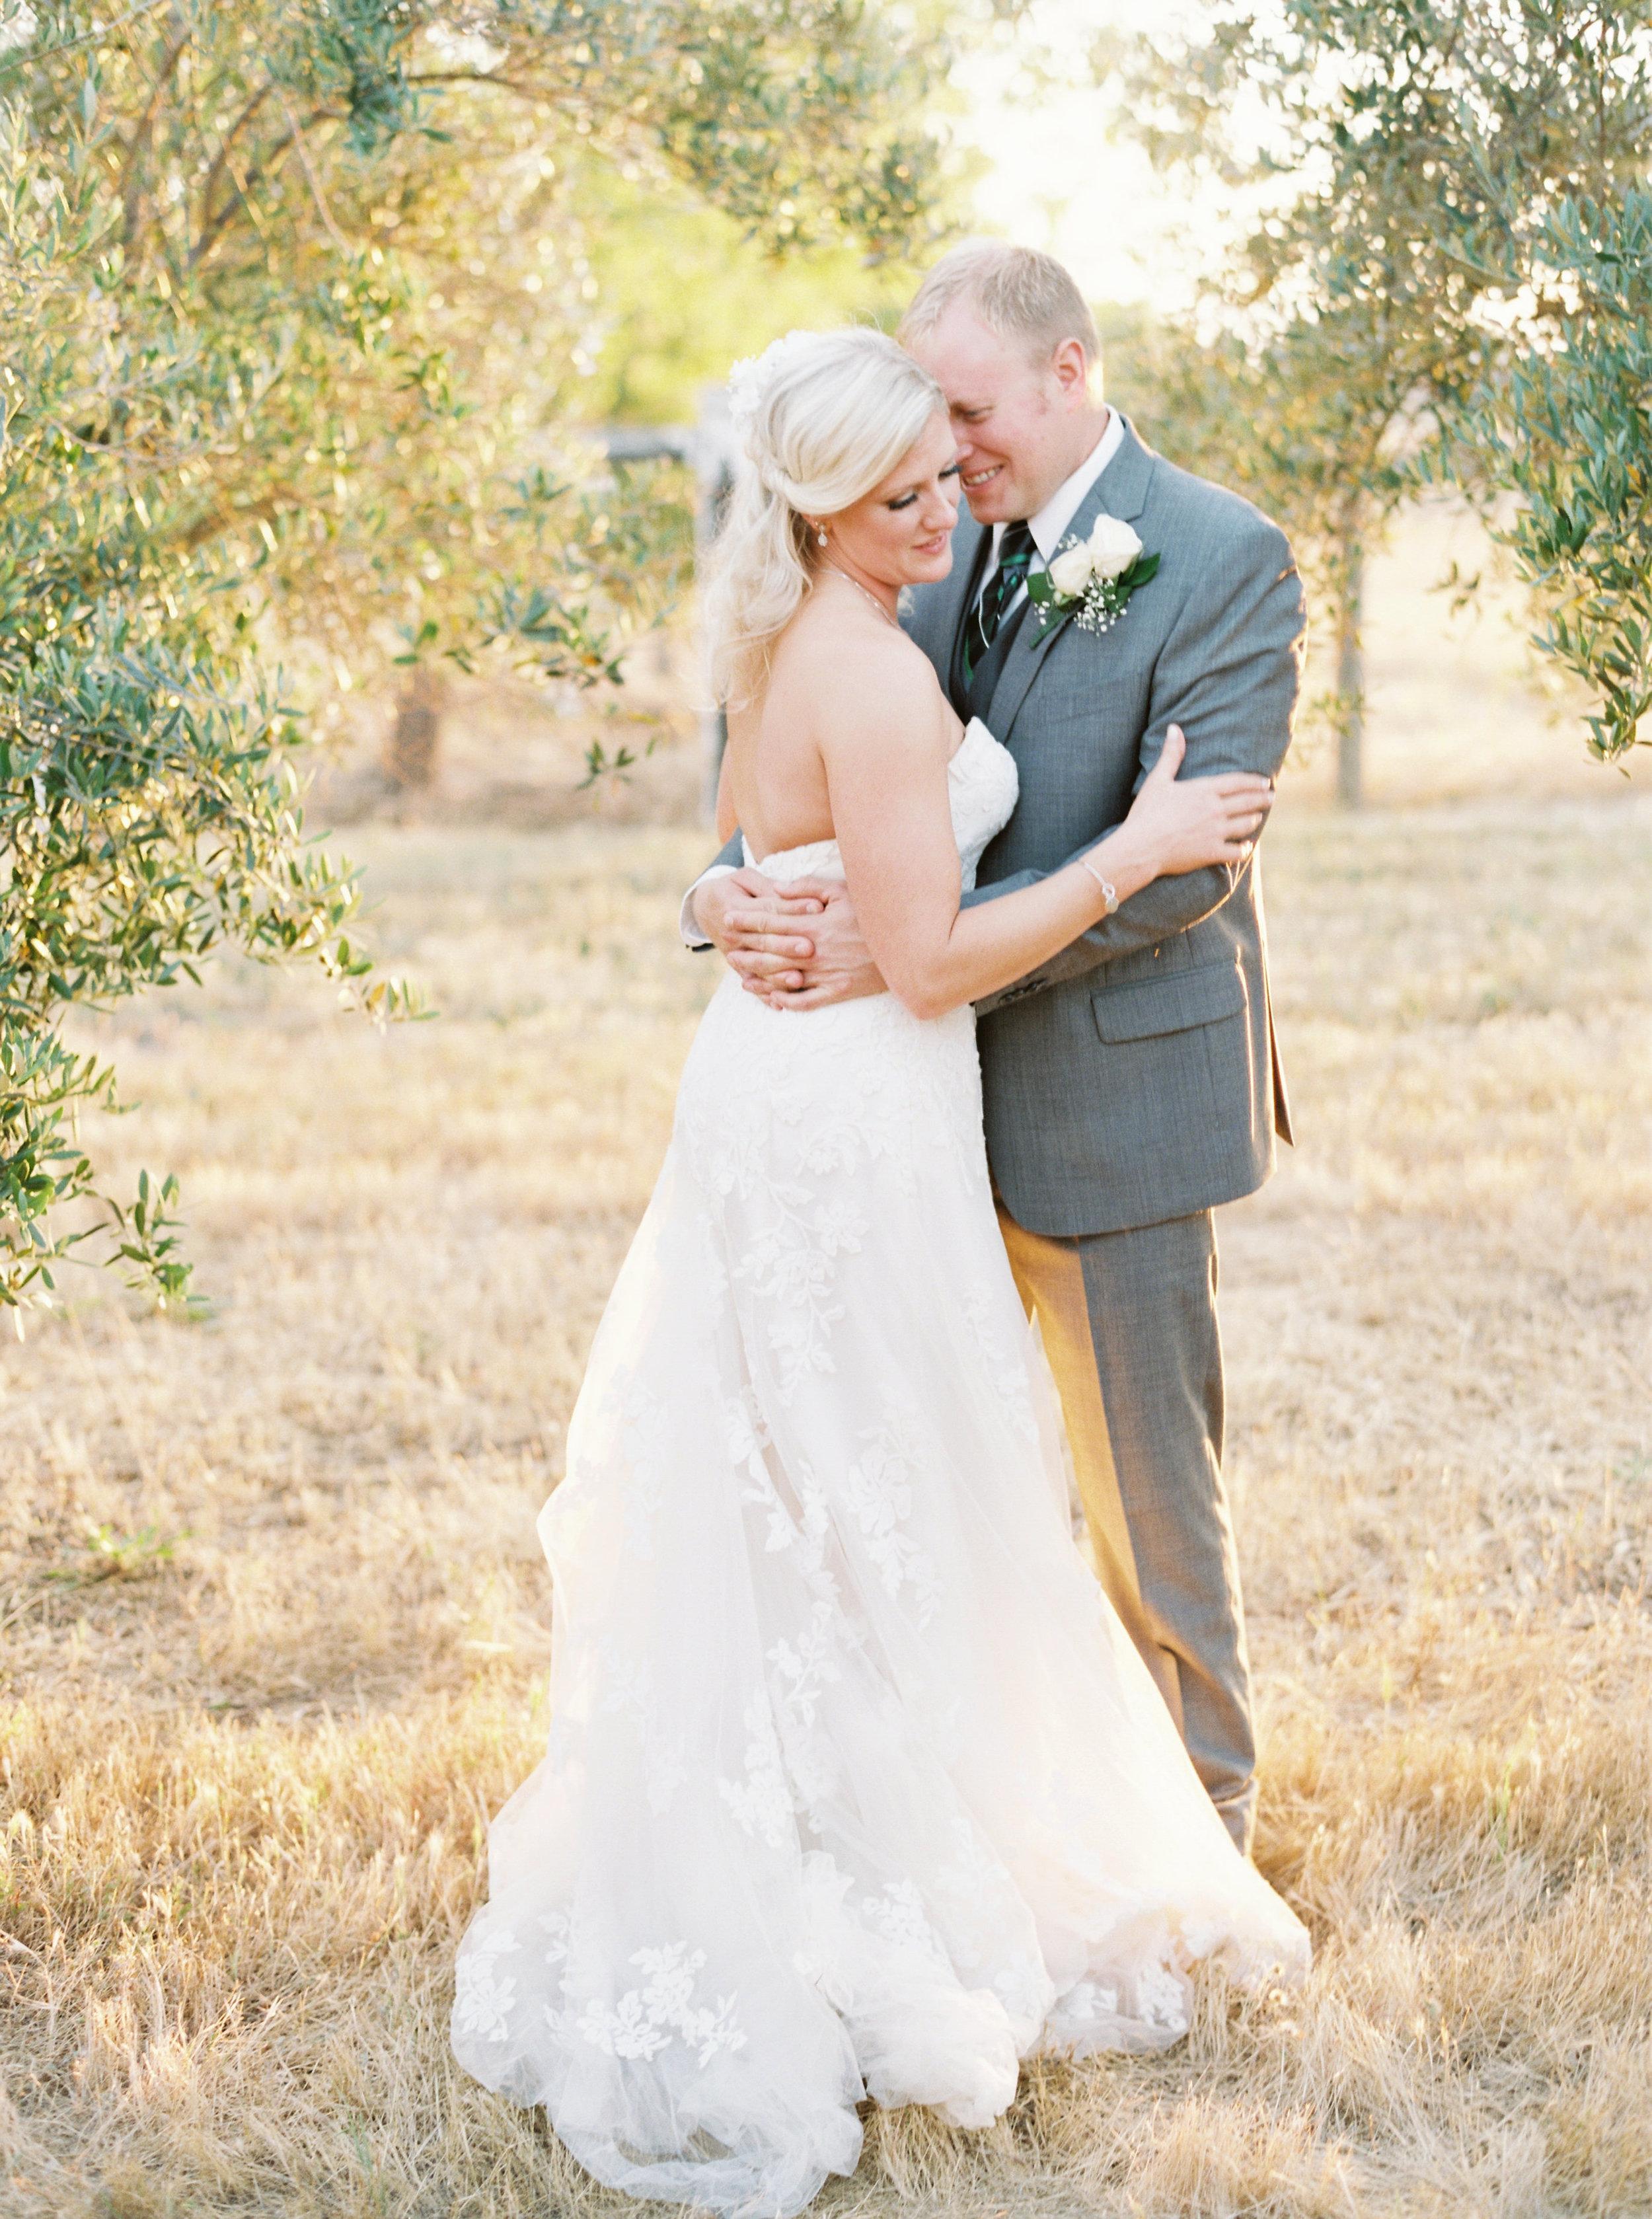 wolfe-heights-event-center-wedding-sacramento-california-wedding-44.jpg